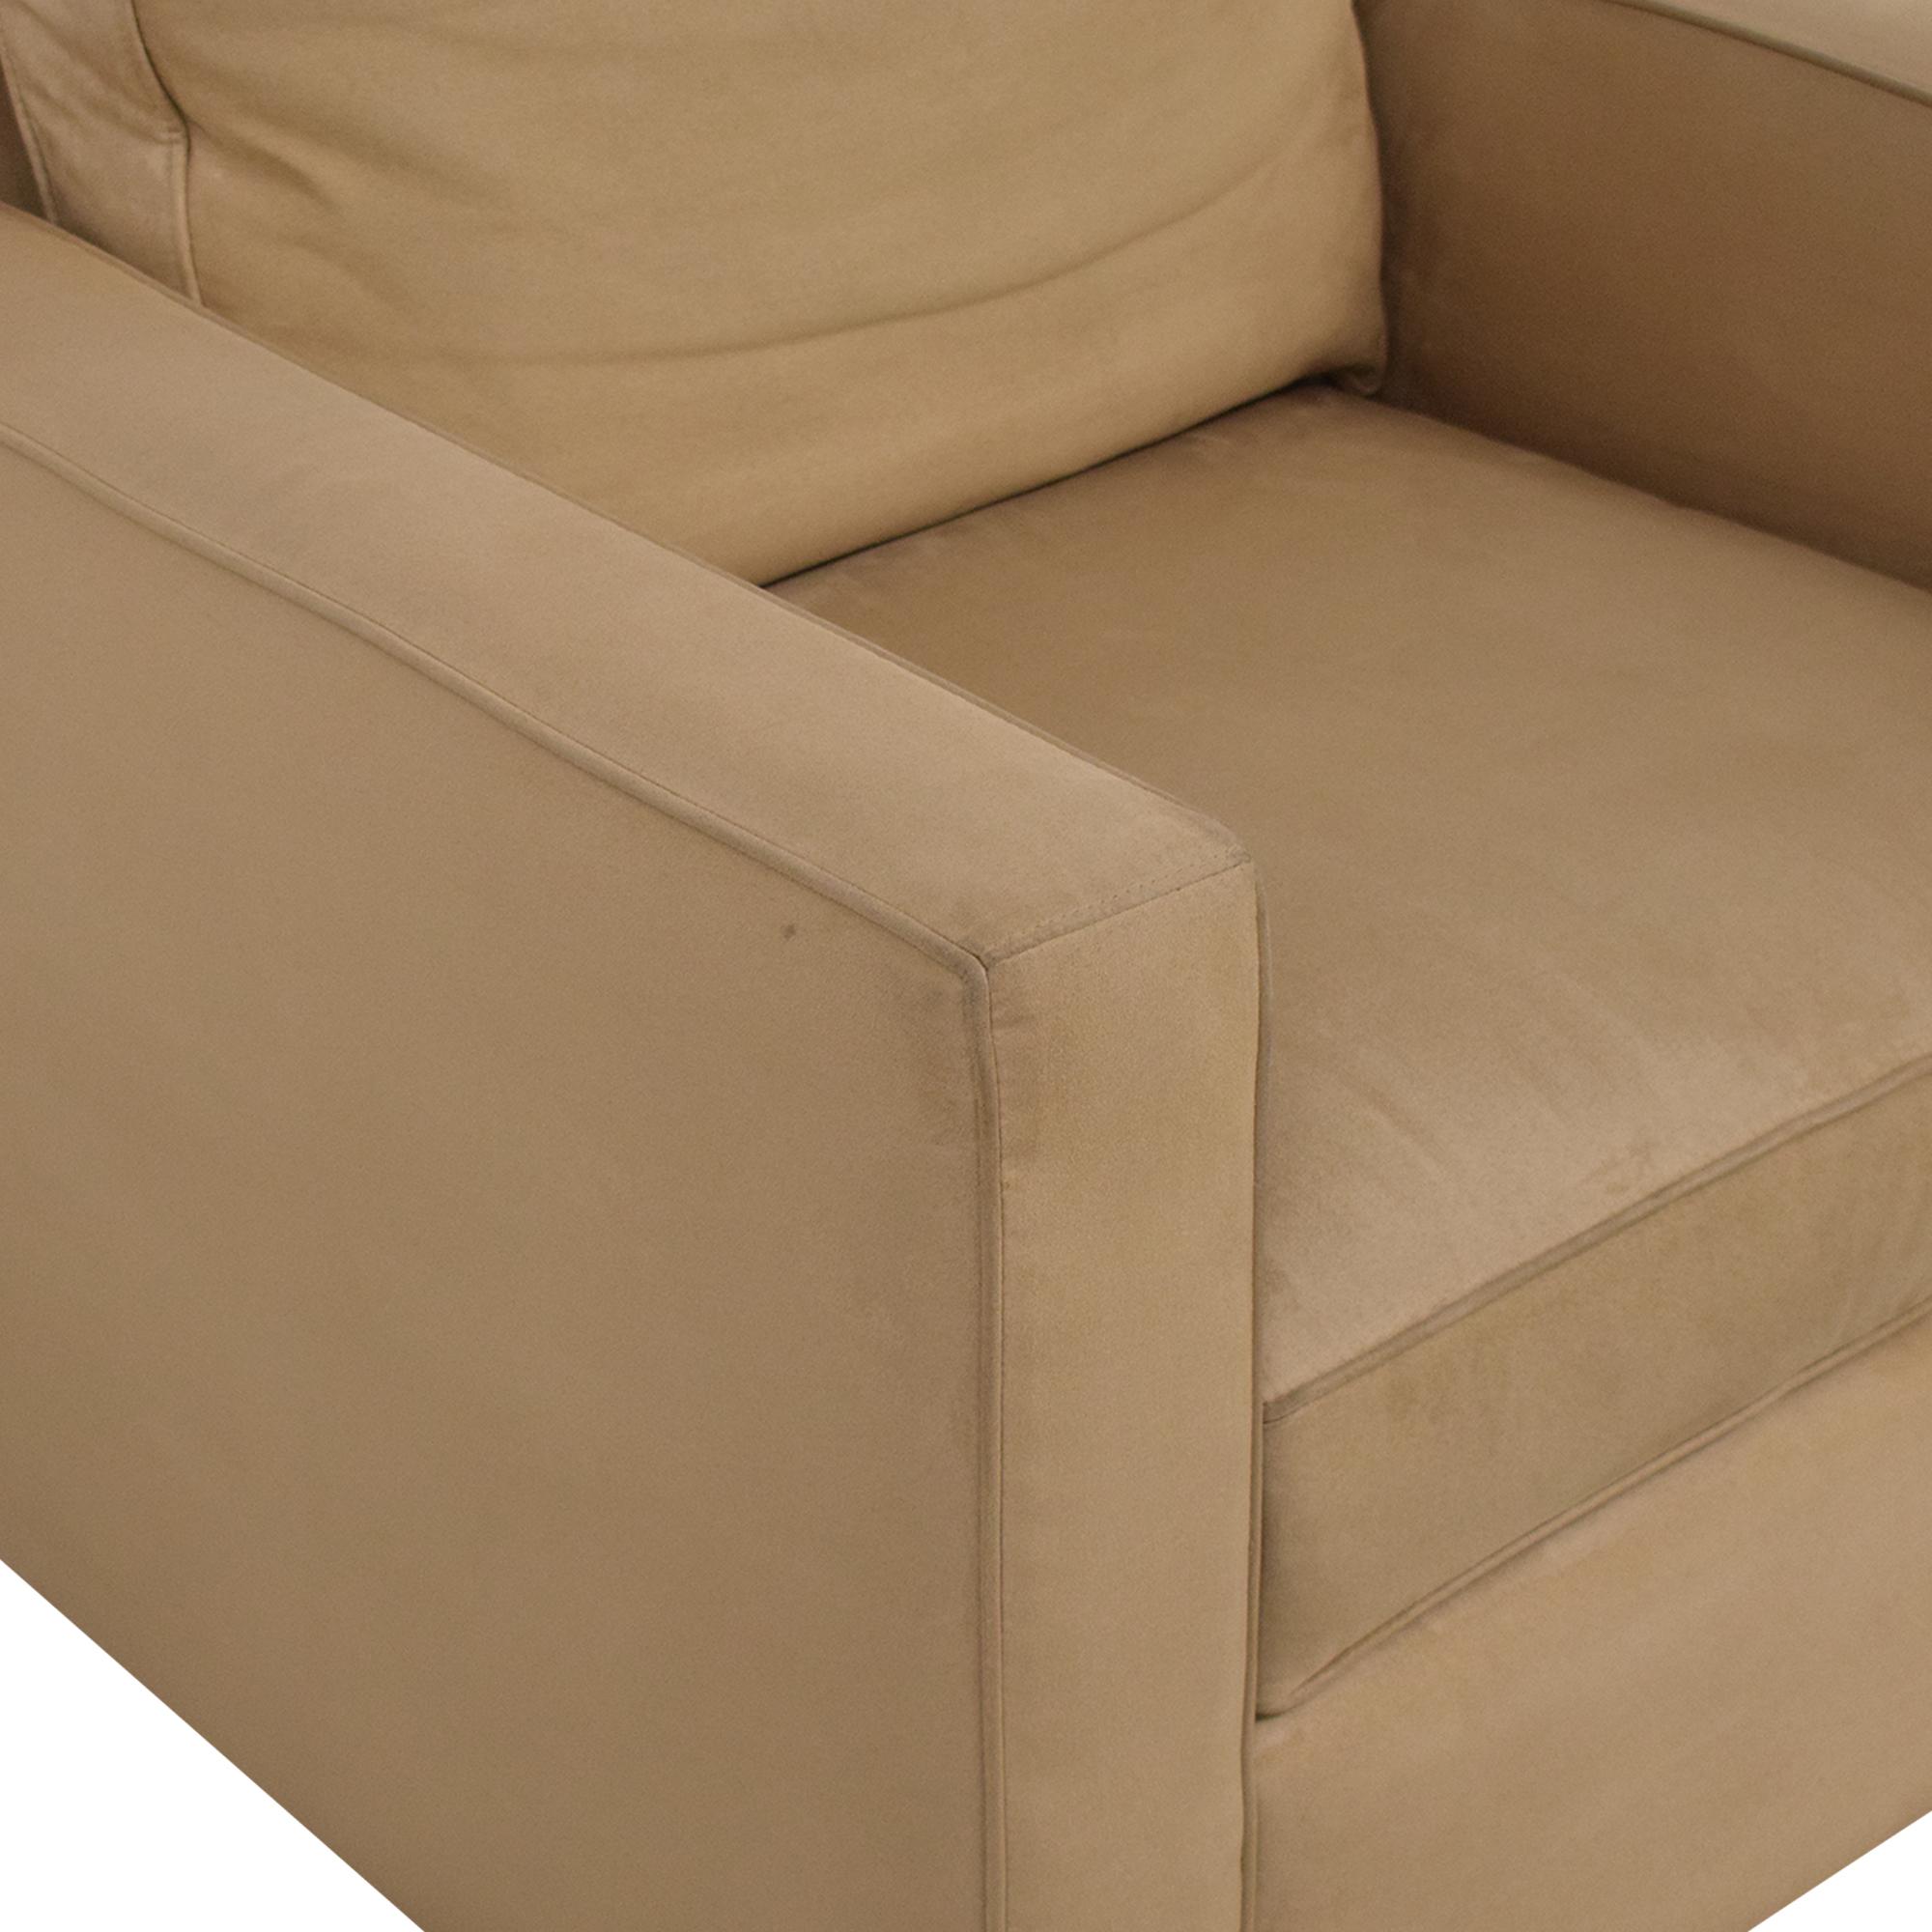 Crate & Barrel Davis Beige Accent Chair / Accent Chairs